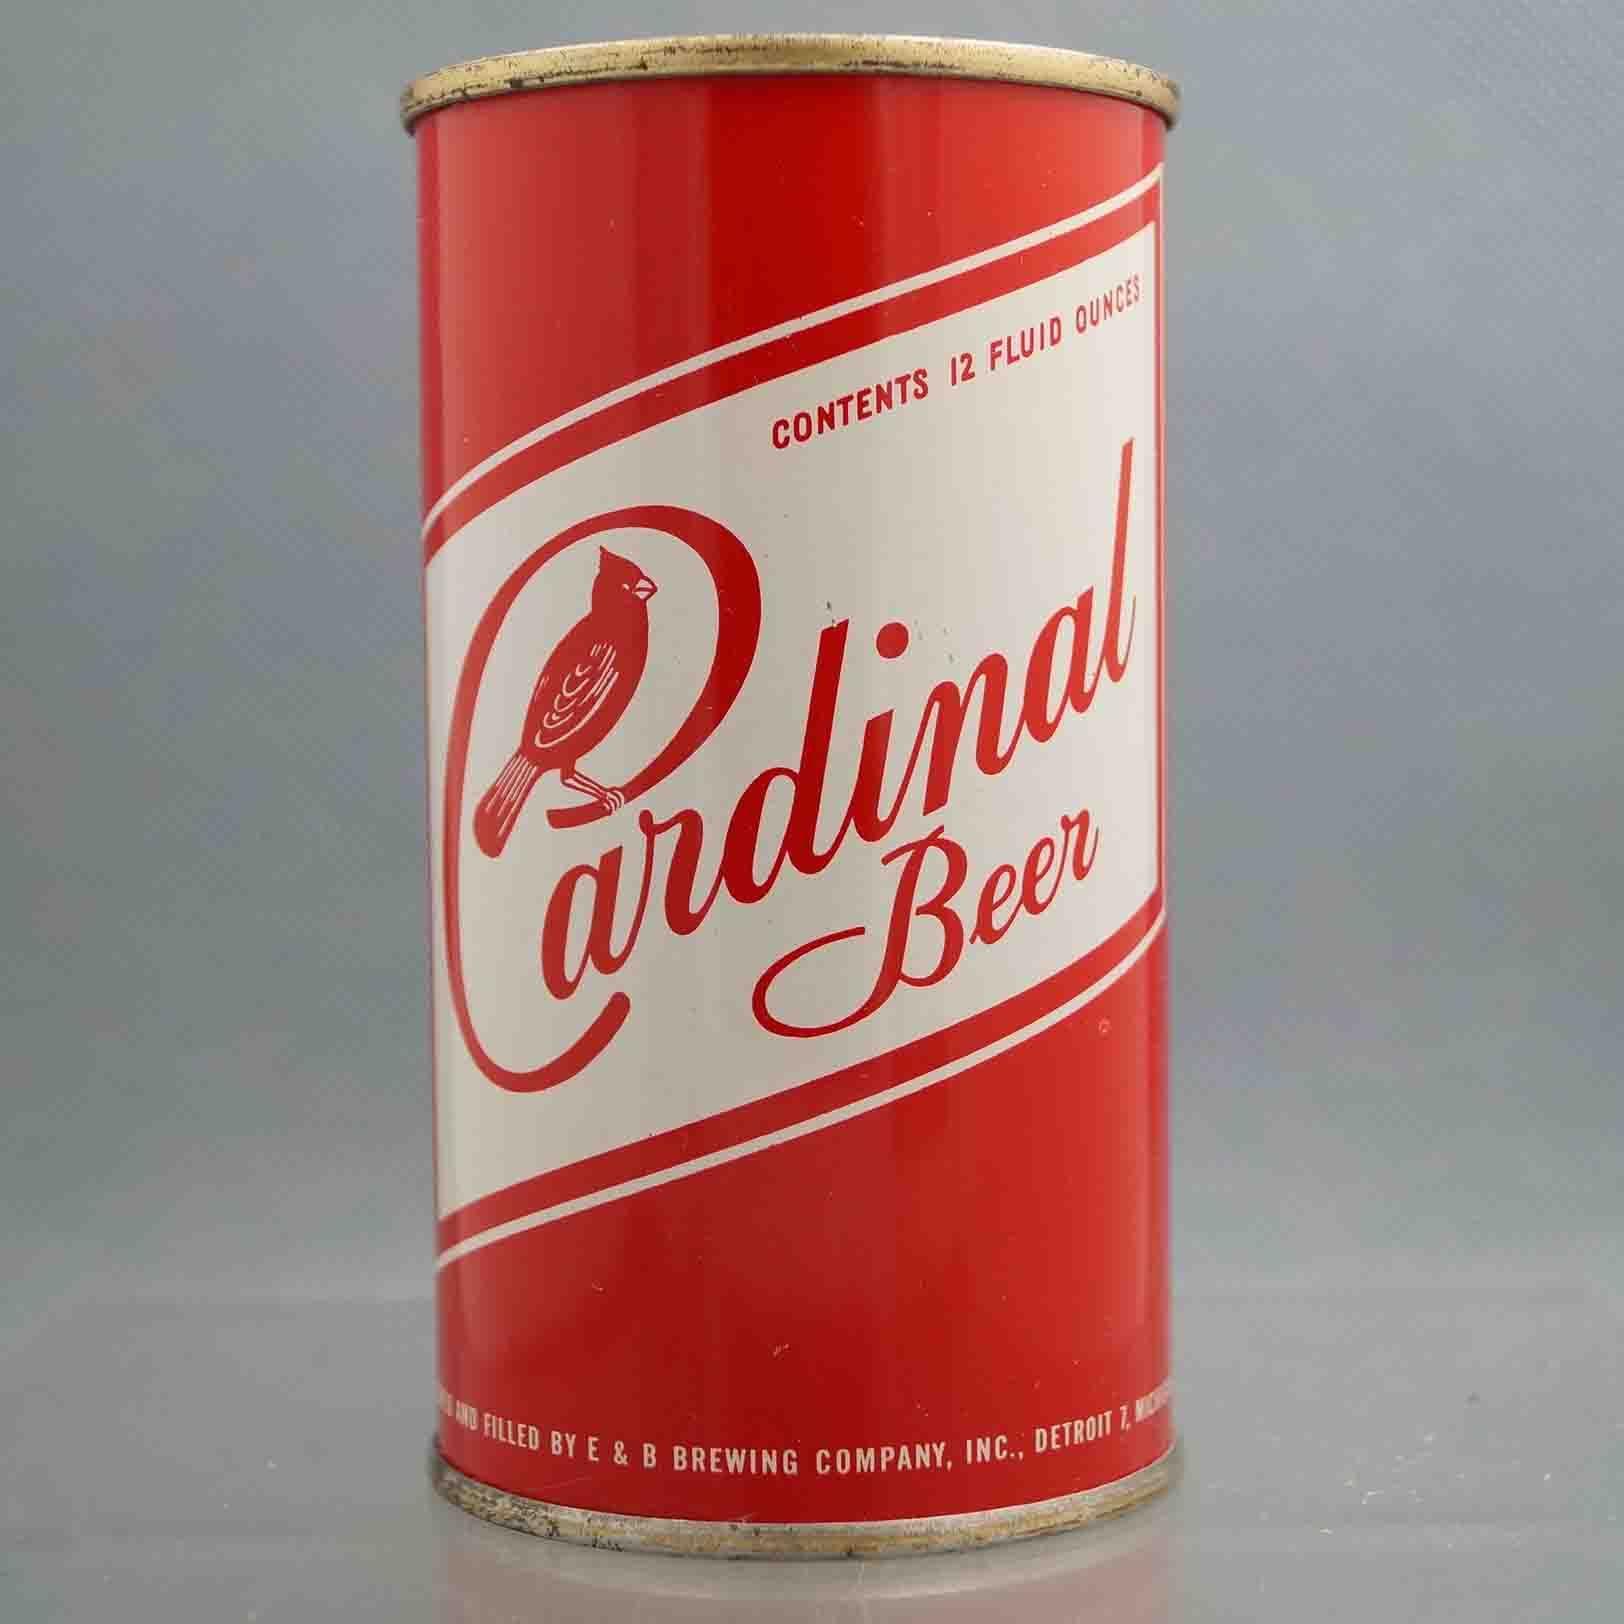 30 Charming Vintage Beer Label Designs Vintage Beer Labels Beer Label Design Vintage Beer